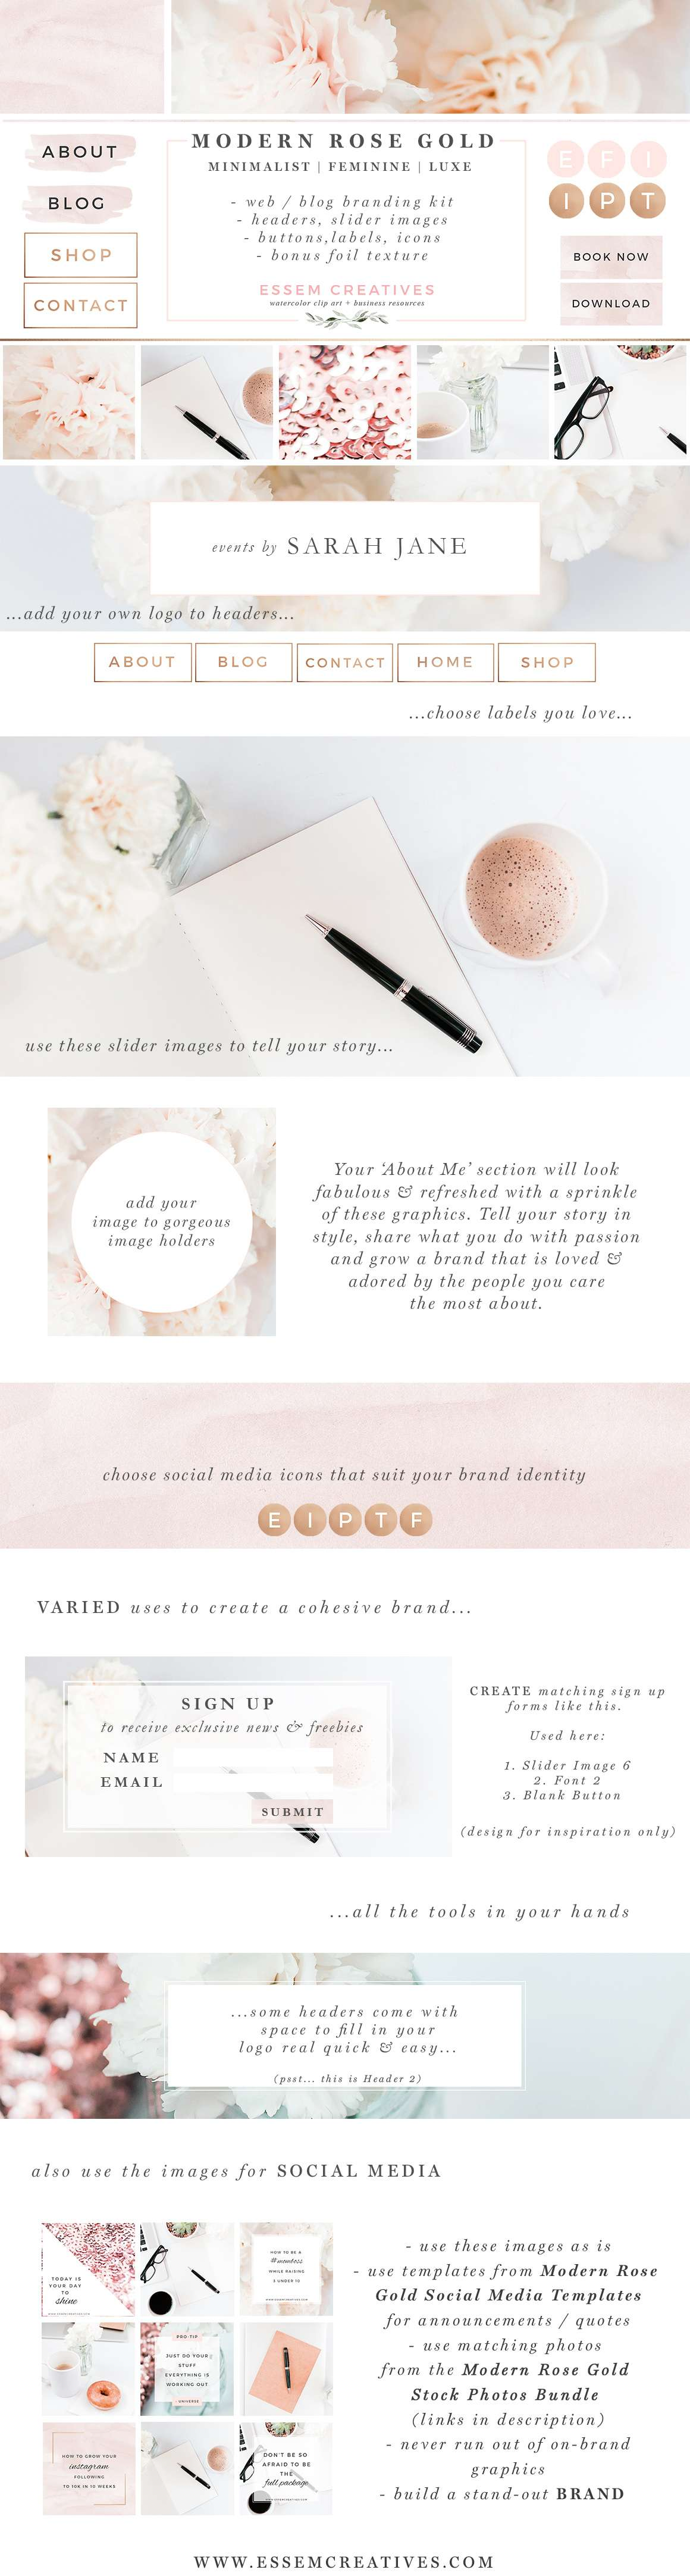 Website Branding Kit, Floral Pink Peach Rose Gold Theme, Blogger Design,  Wordpress Blog Header, Social Media Icons, Buttons, Labels, Borders